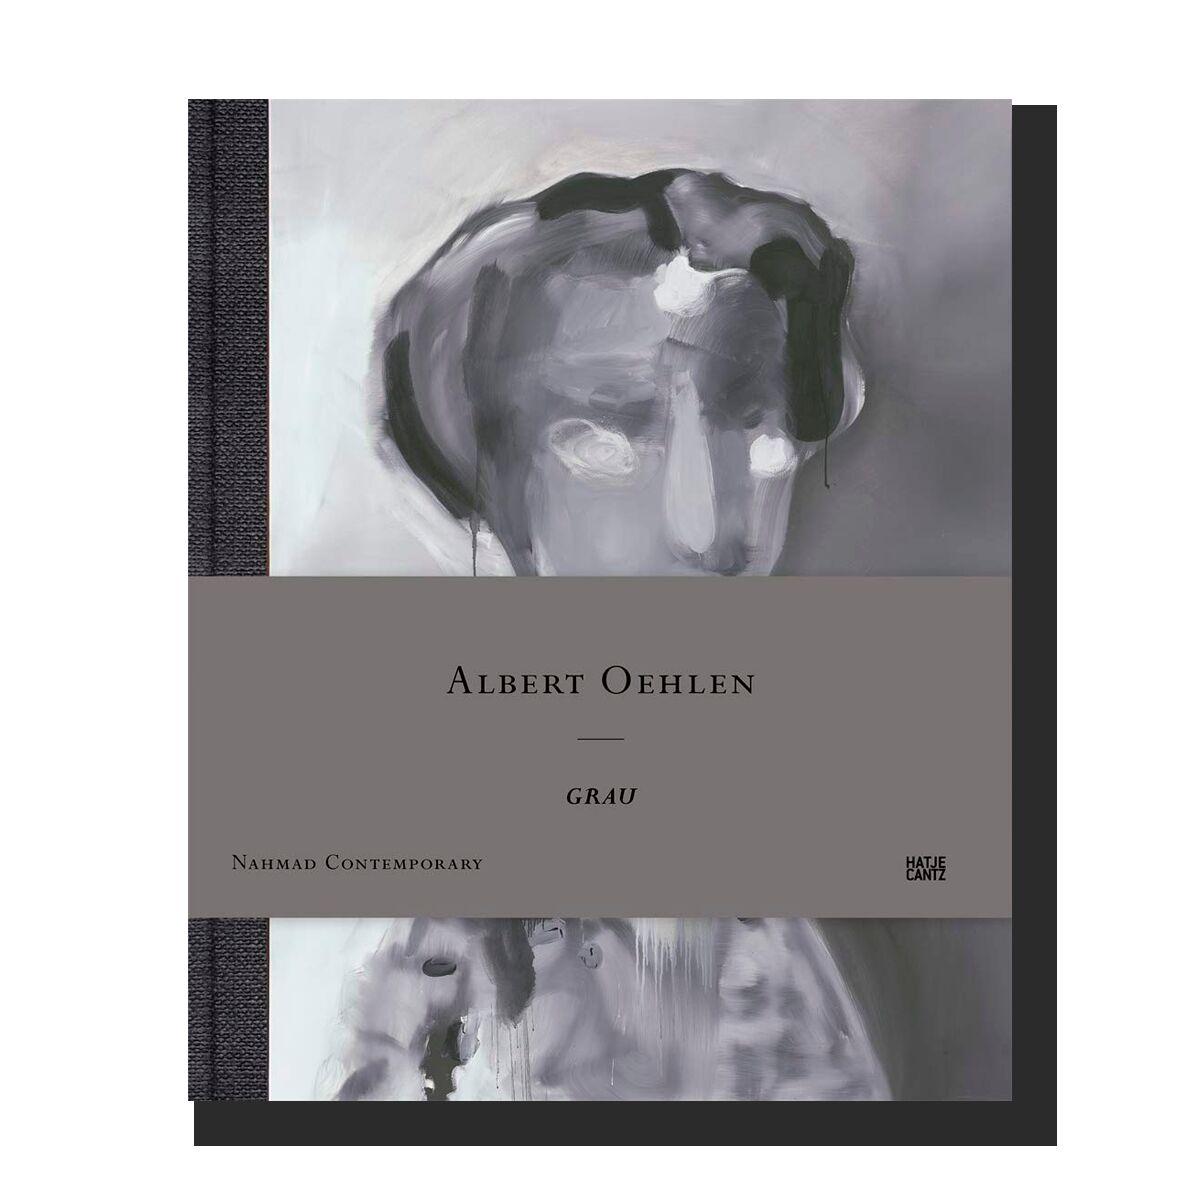 Albert Oehlen: Grau